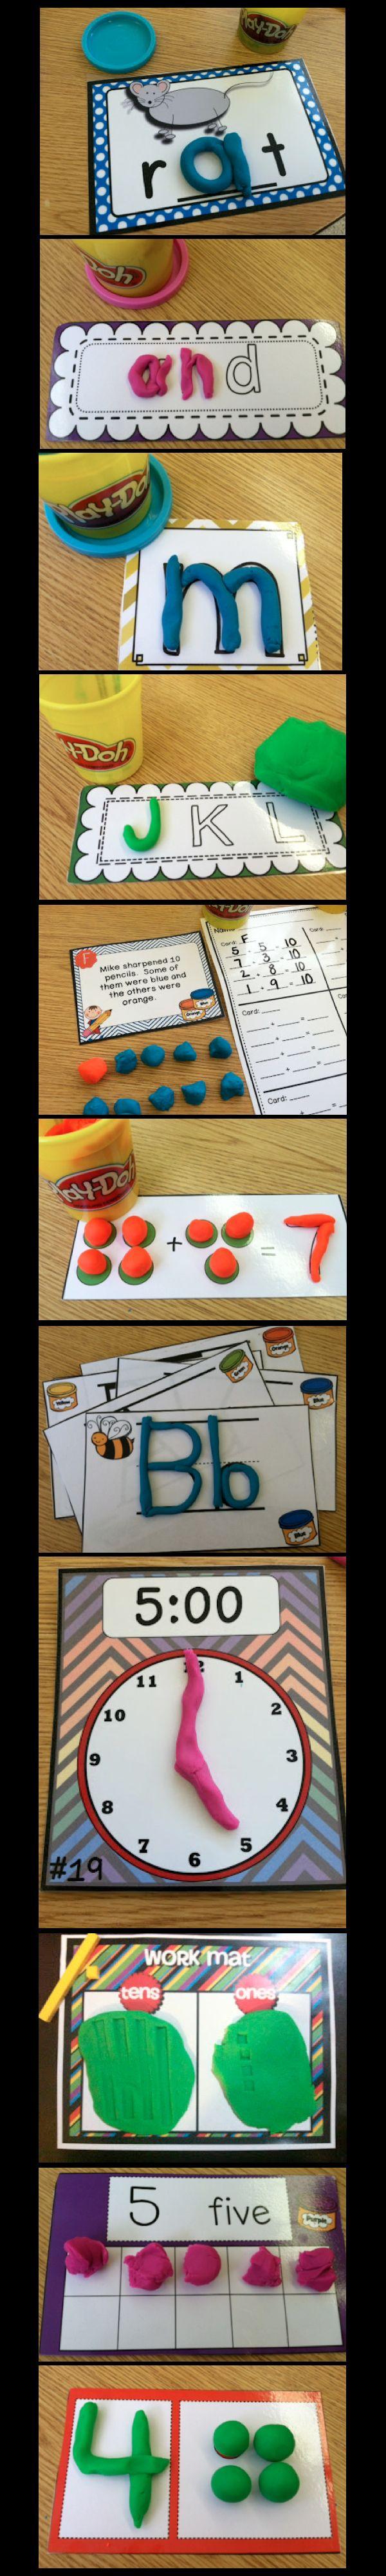 Leuke ideeën om klei te gebruiken in de klas